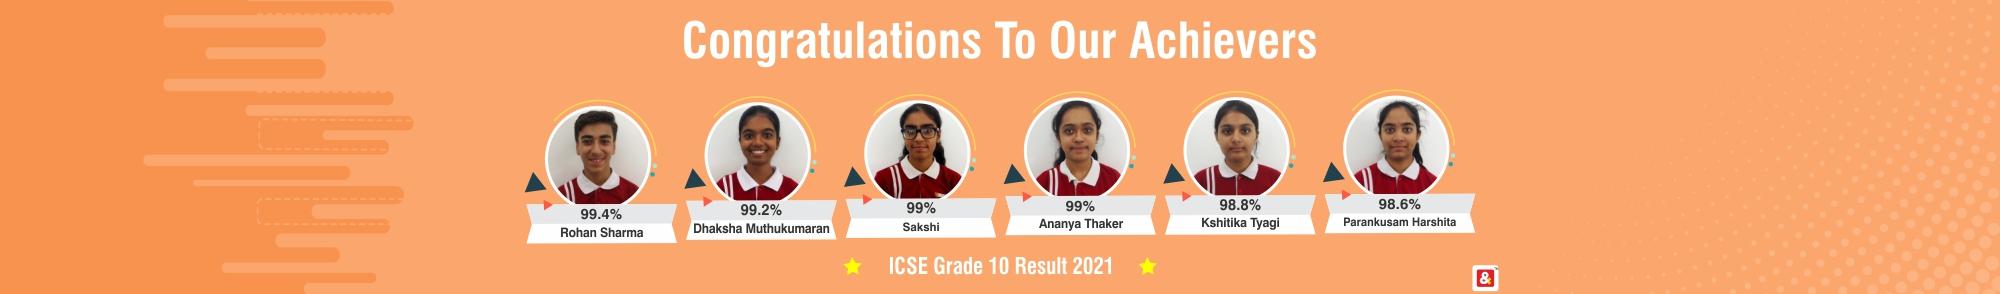 VIBGYOR High School Haralur Road result